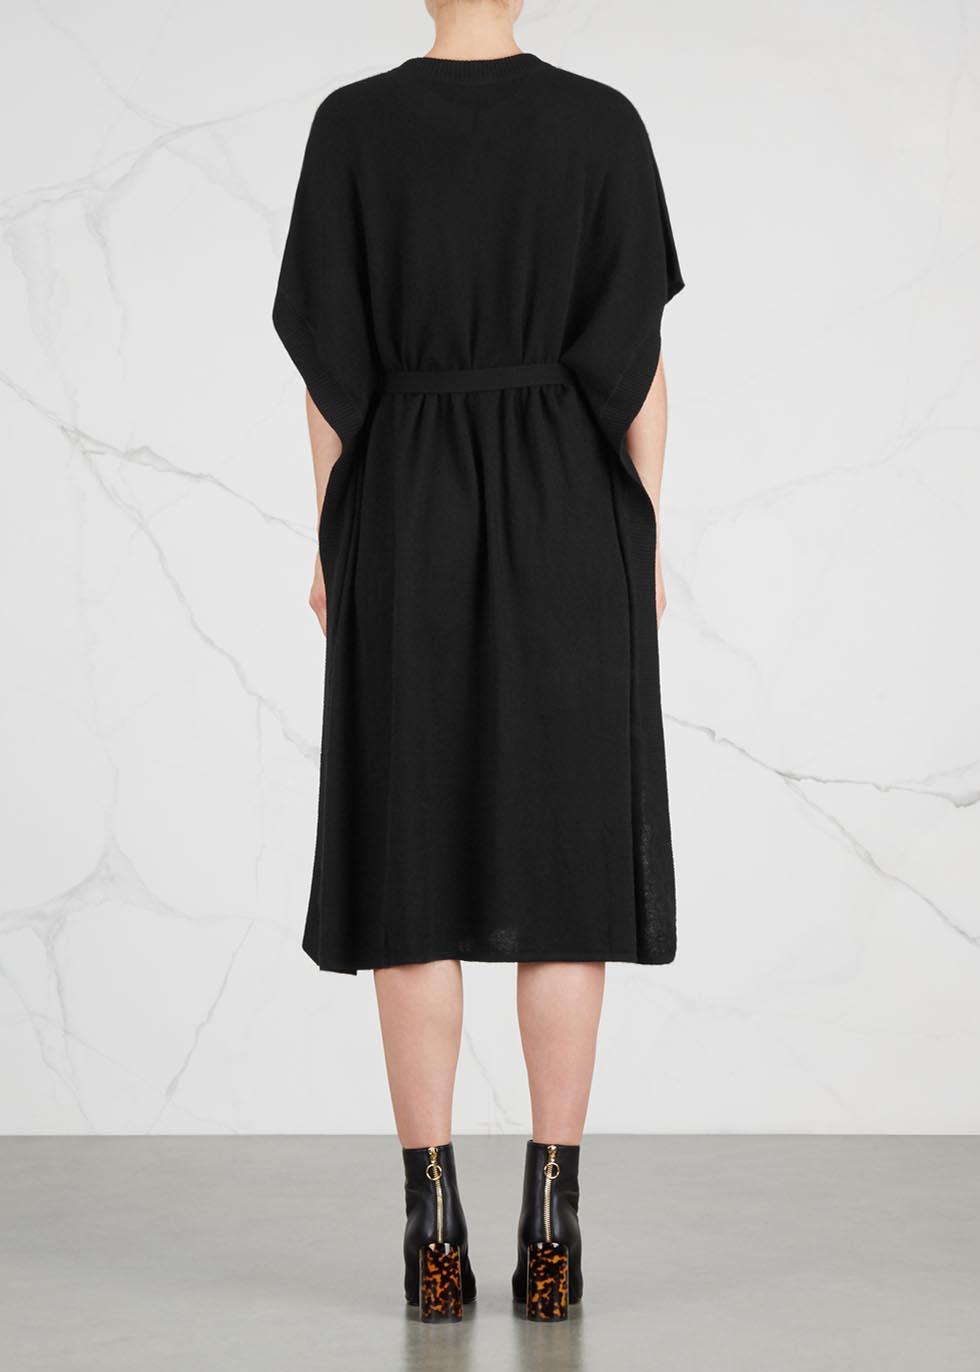 Goa black cashmere dress - Le Kasha